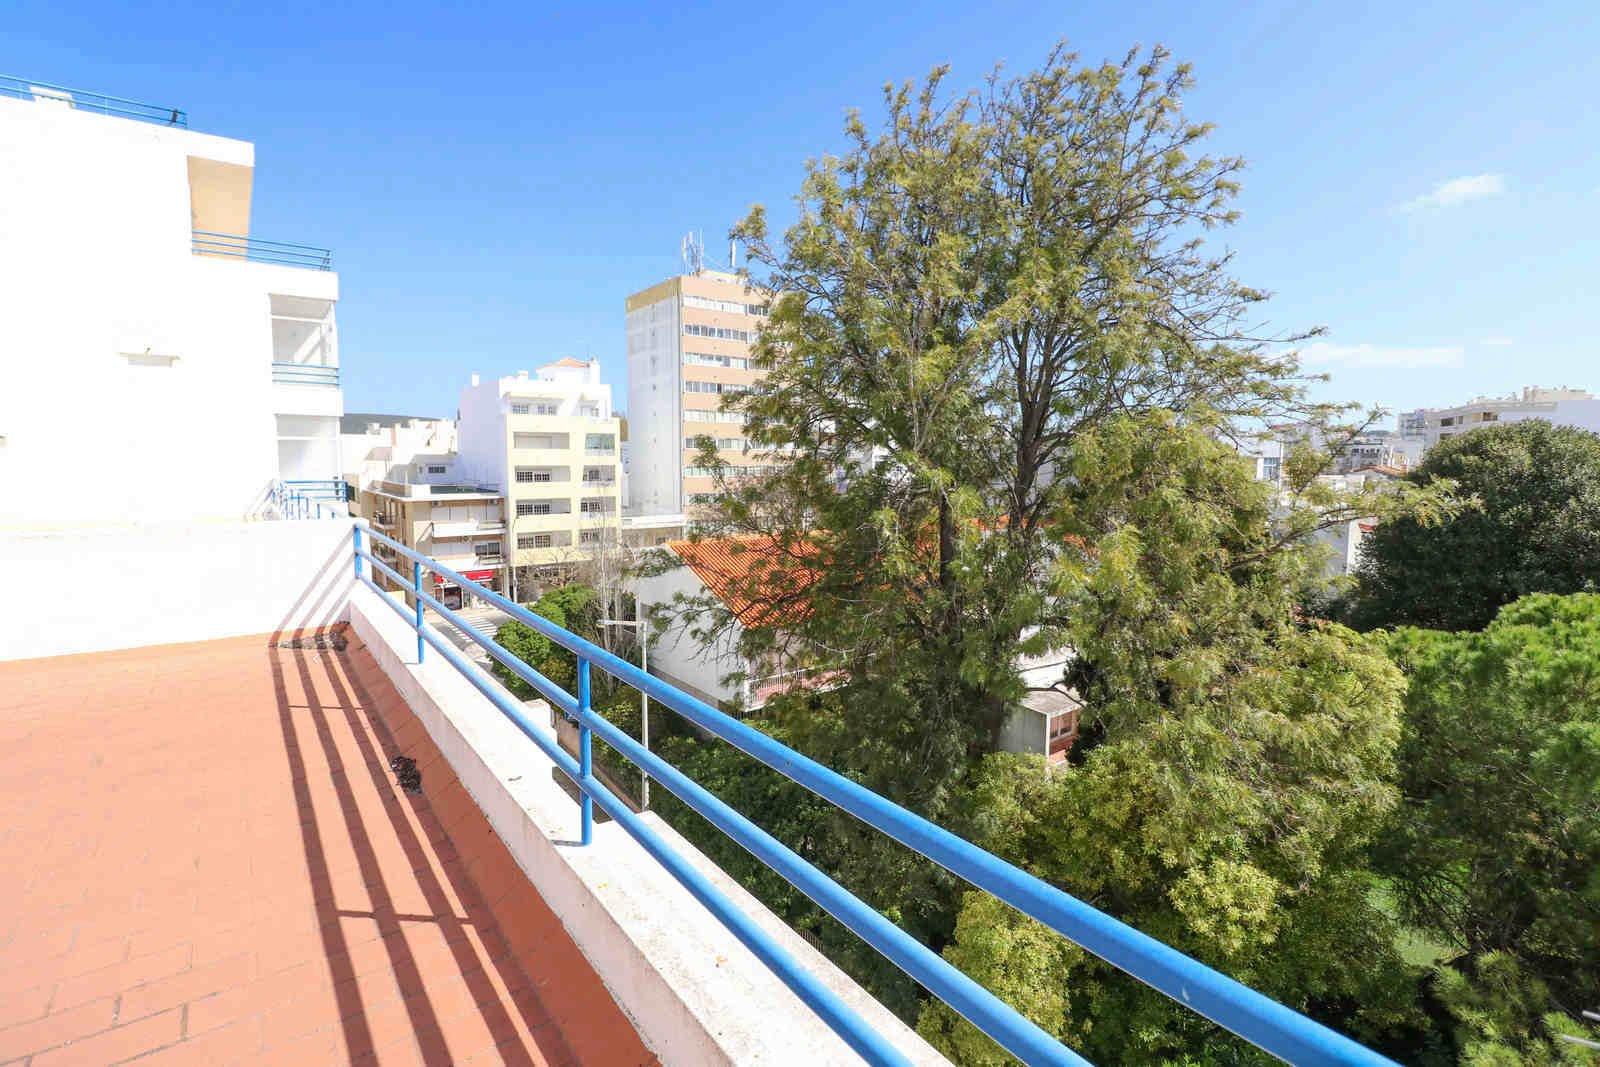 3 Bedroom Apartment Loule, Central Algarve Ref: PA3553